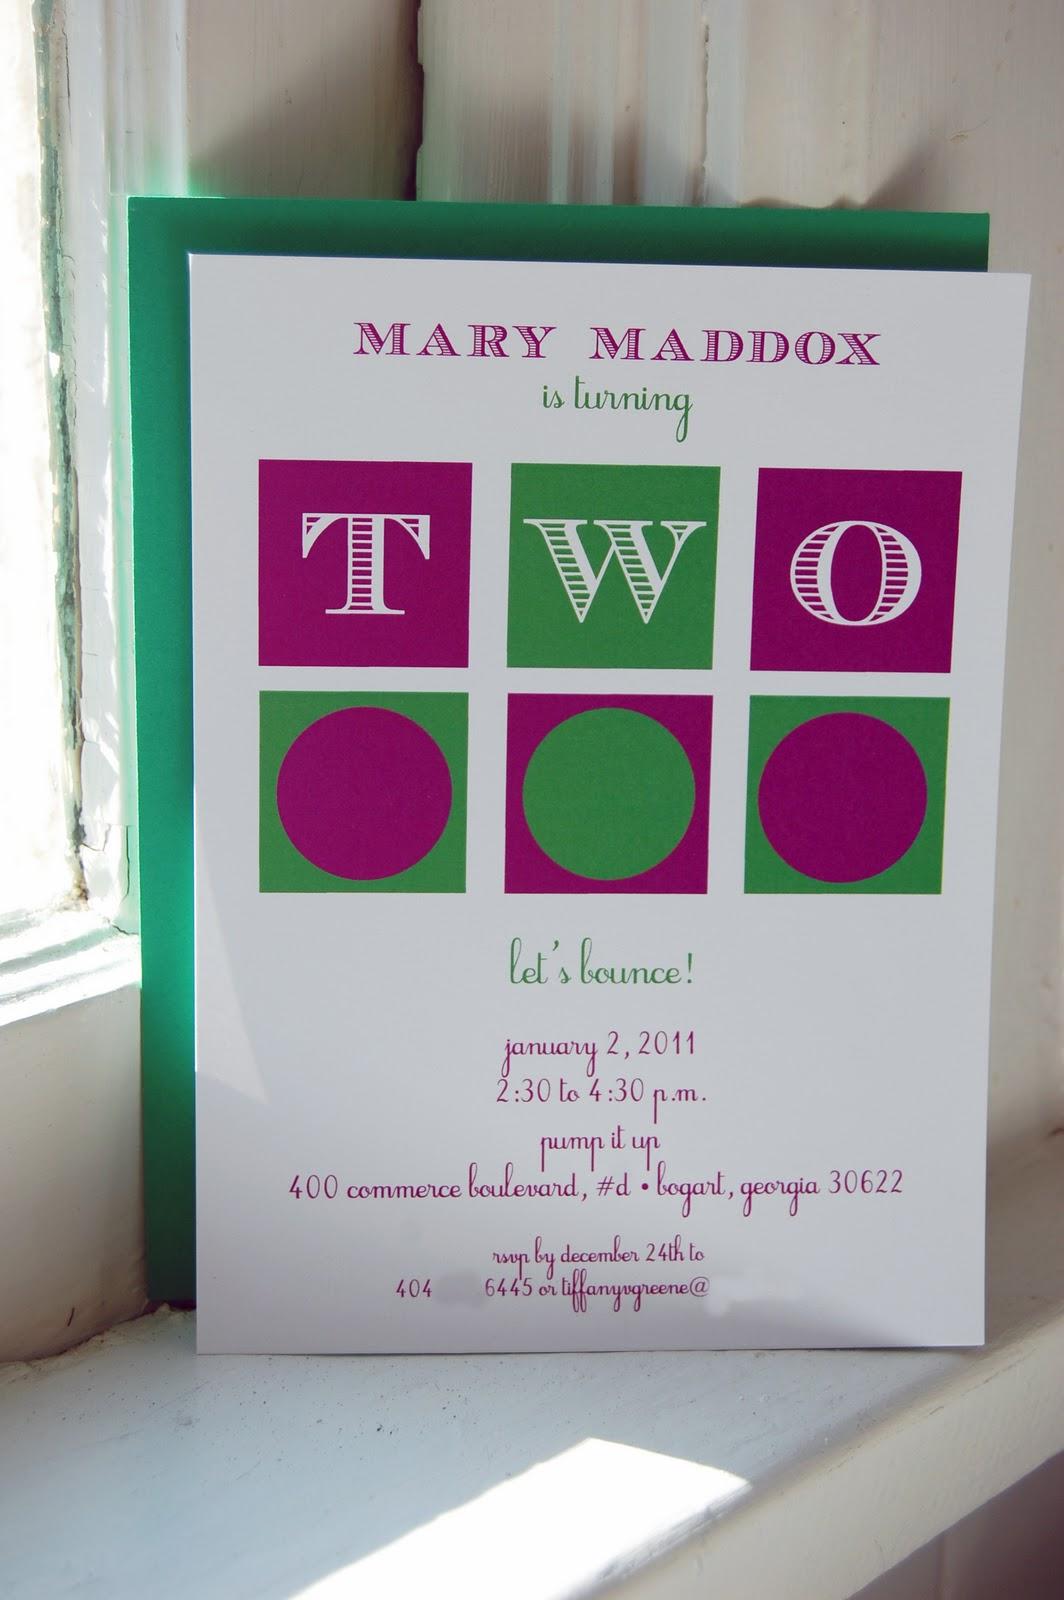 mary maddox\'s 2nd birthday party invitation suite   Calliespondence